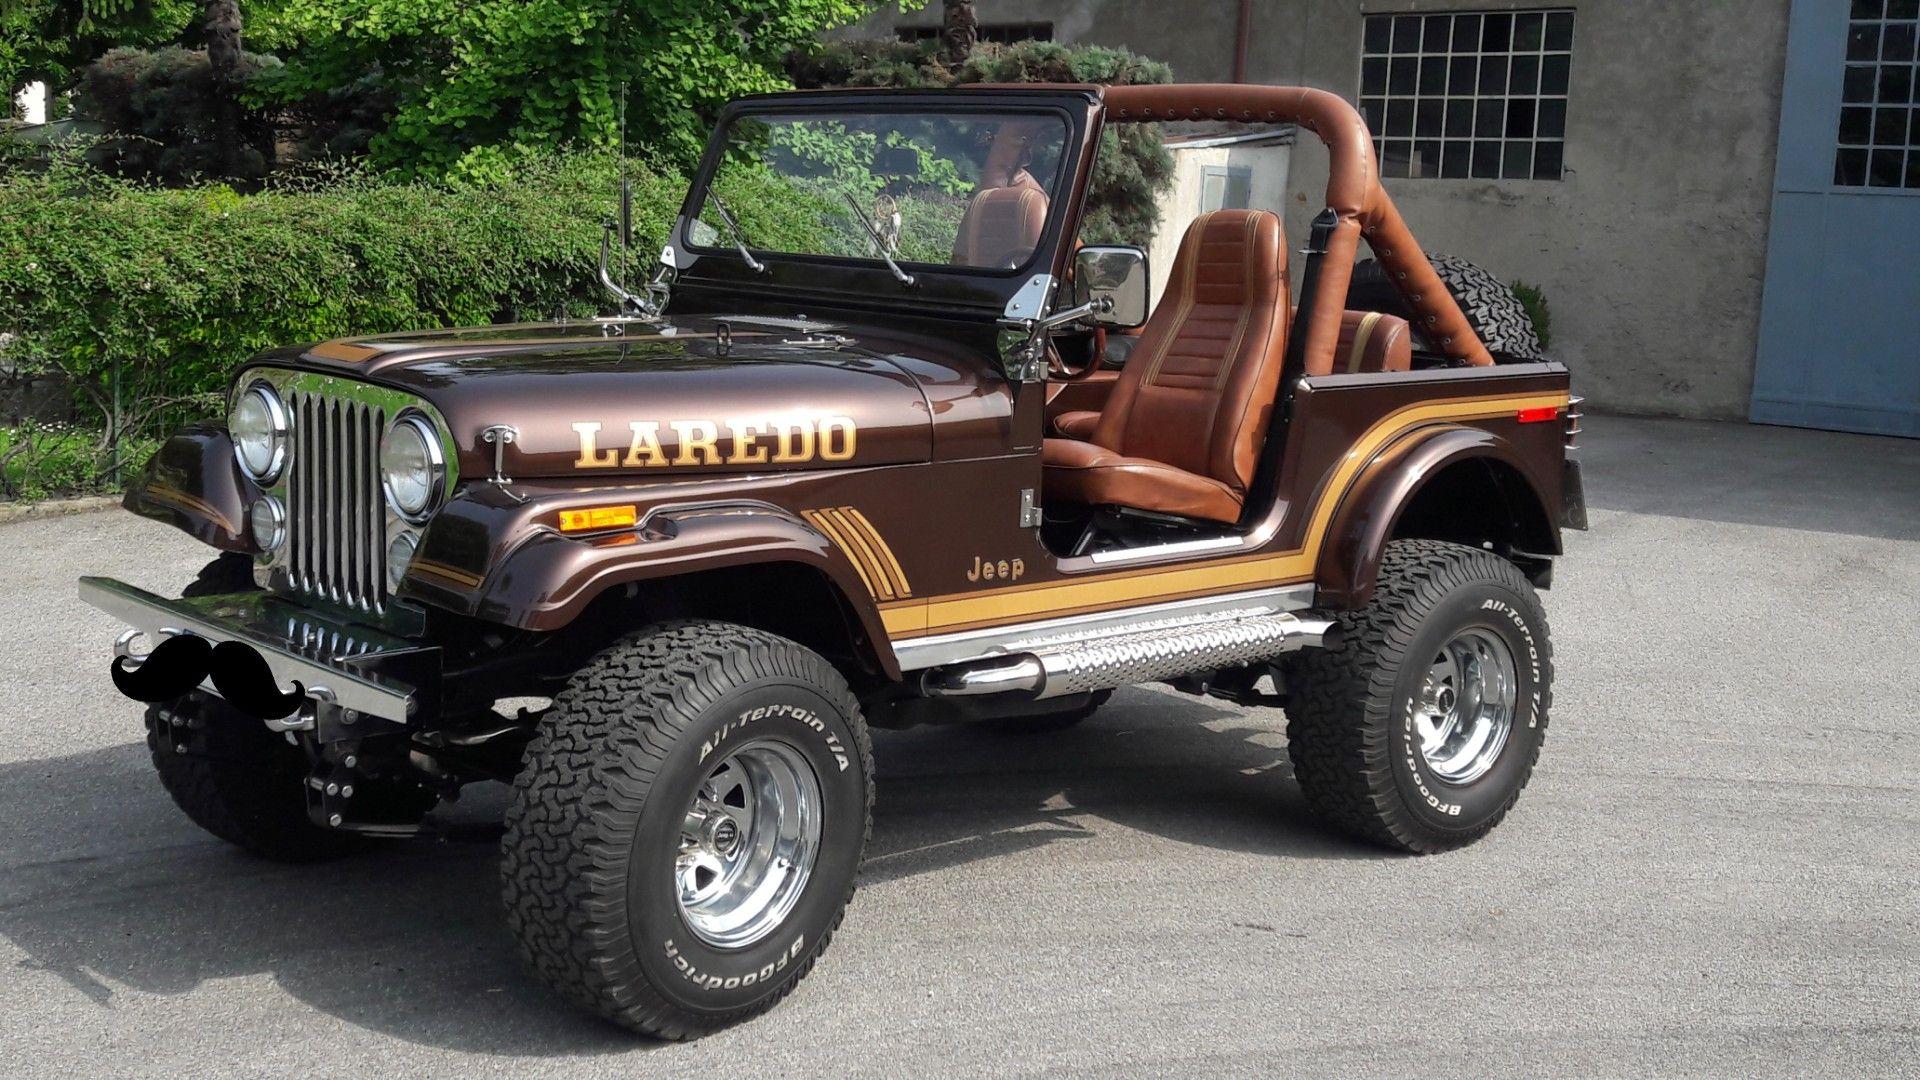 Cj7 Laredo Amc 304 Jeep Cj Jeep Cj7 Jeep Cj5